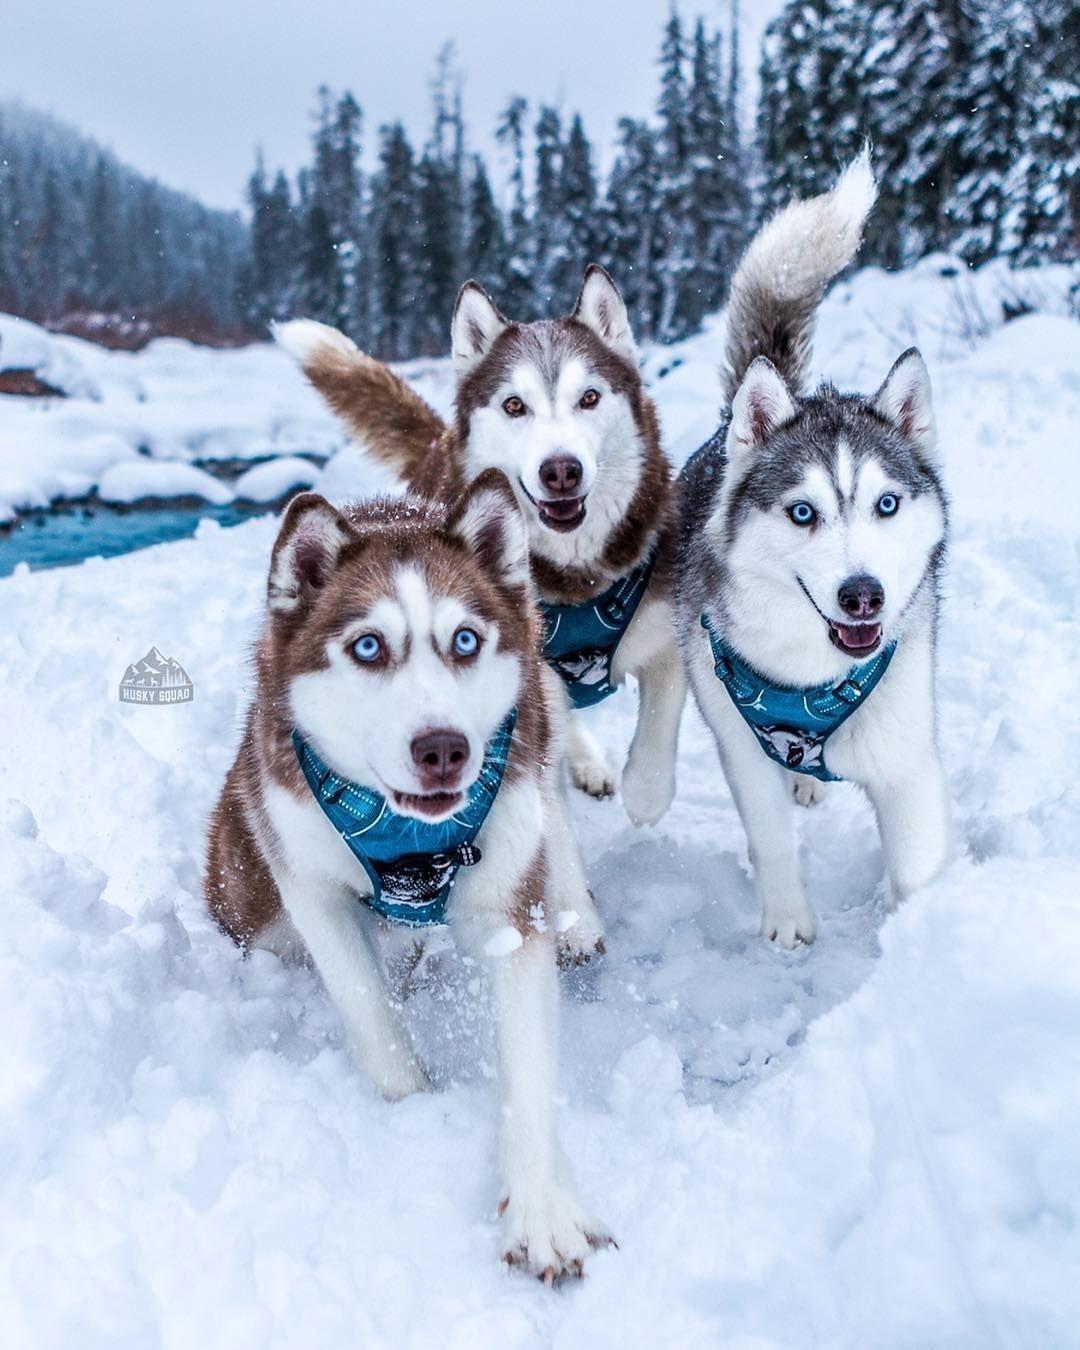 Husky Pedia When Your Friend Opens A Bag Of Chips Tag 3 Friends Huskysquad Husky Dogs Husky Breeds Siberian Husky